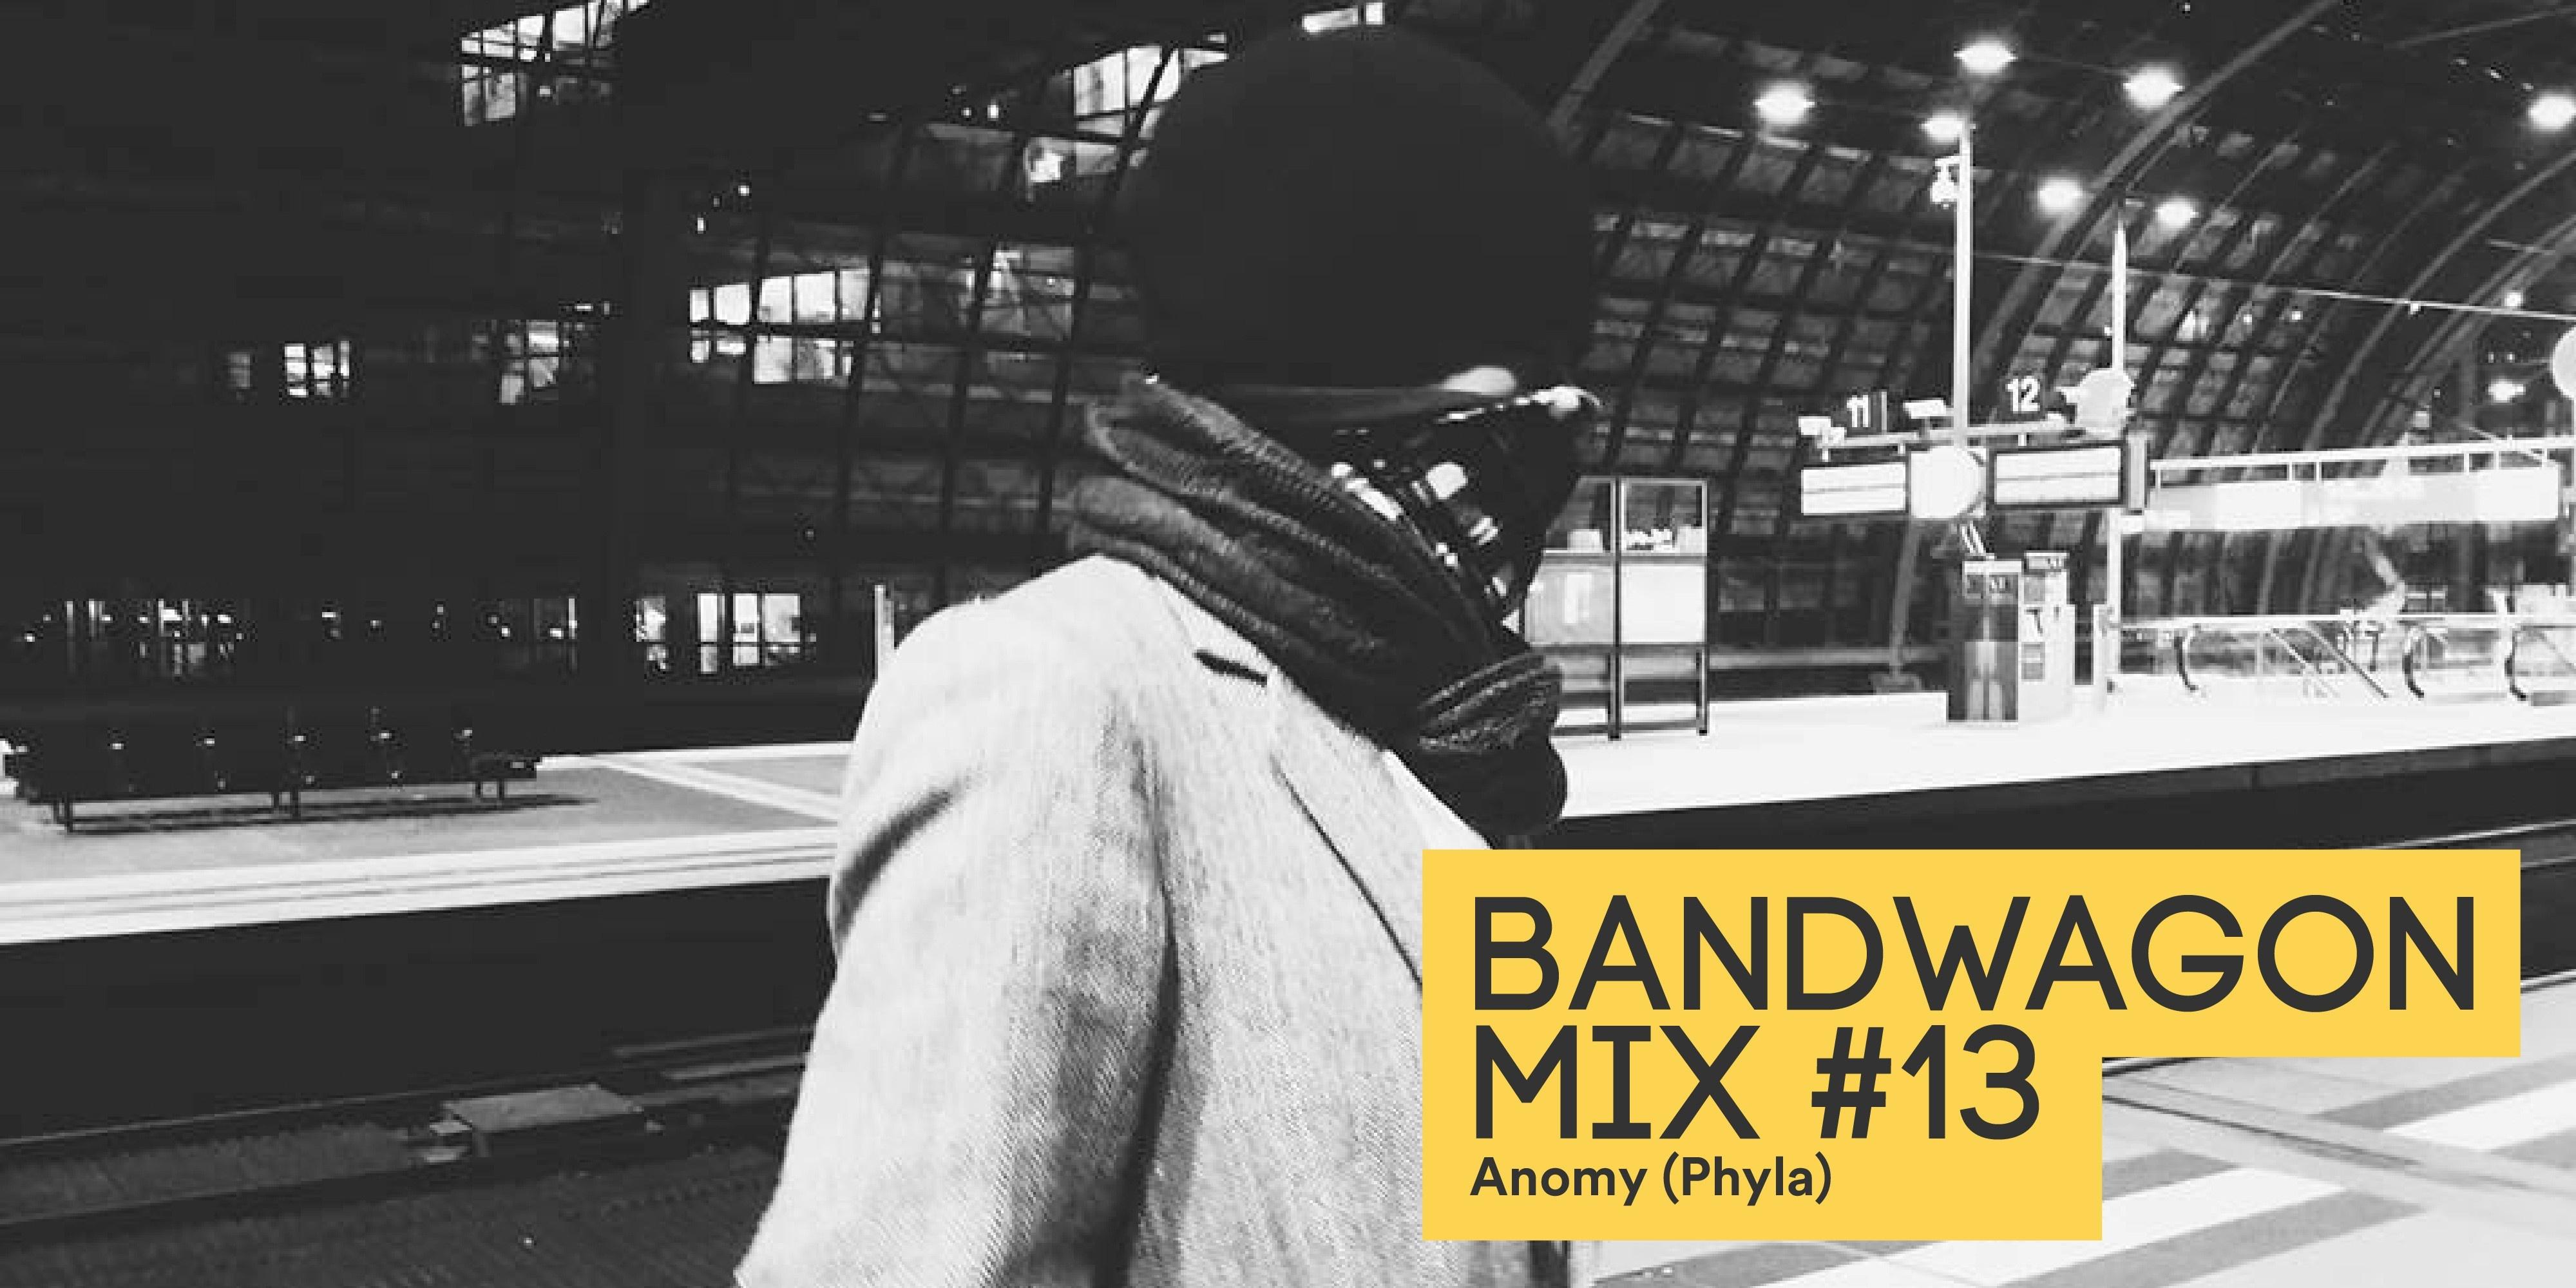 Bandwagon Mix #13: Anomy (Phyla)